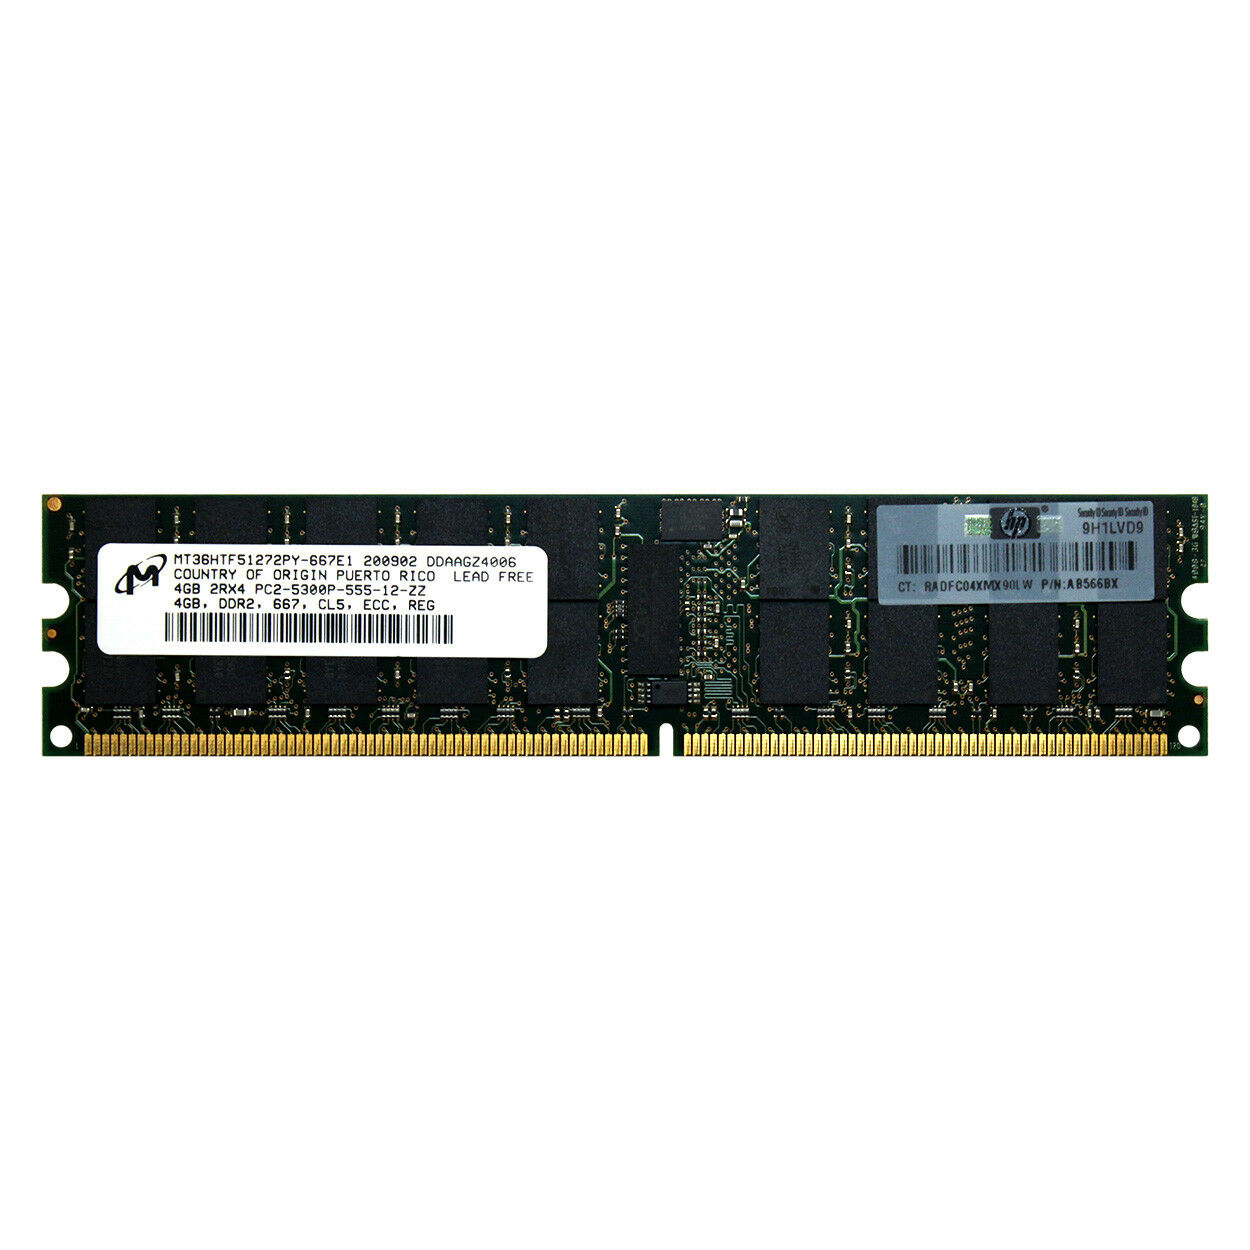 HP AB566BX 4GB DDR2 PC2-5300R 667MHz ECC REGISTERED SERVER SPEICHER RAM